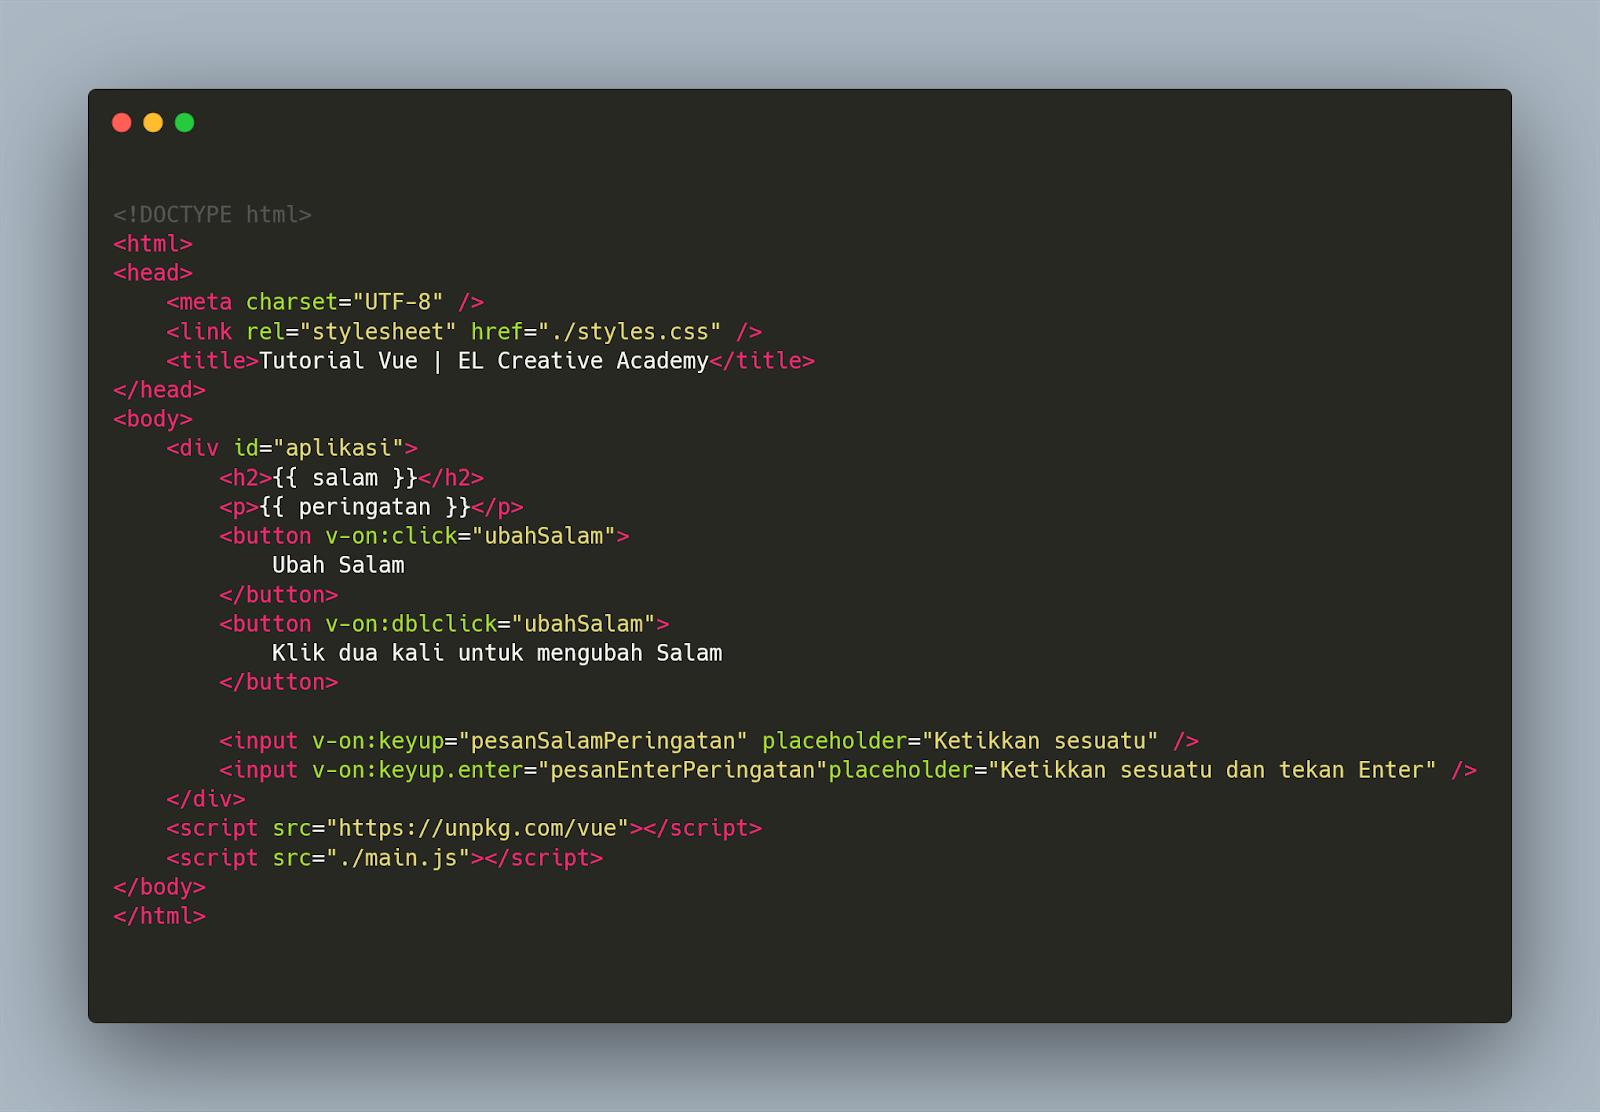 contoh Screenshot kode yang diambil dengan menggunakan Carbon